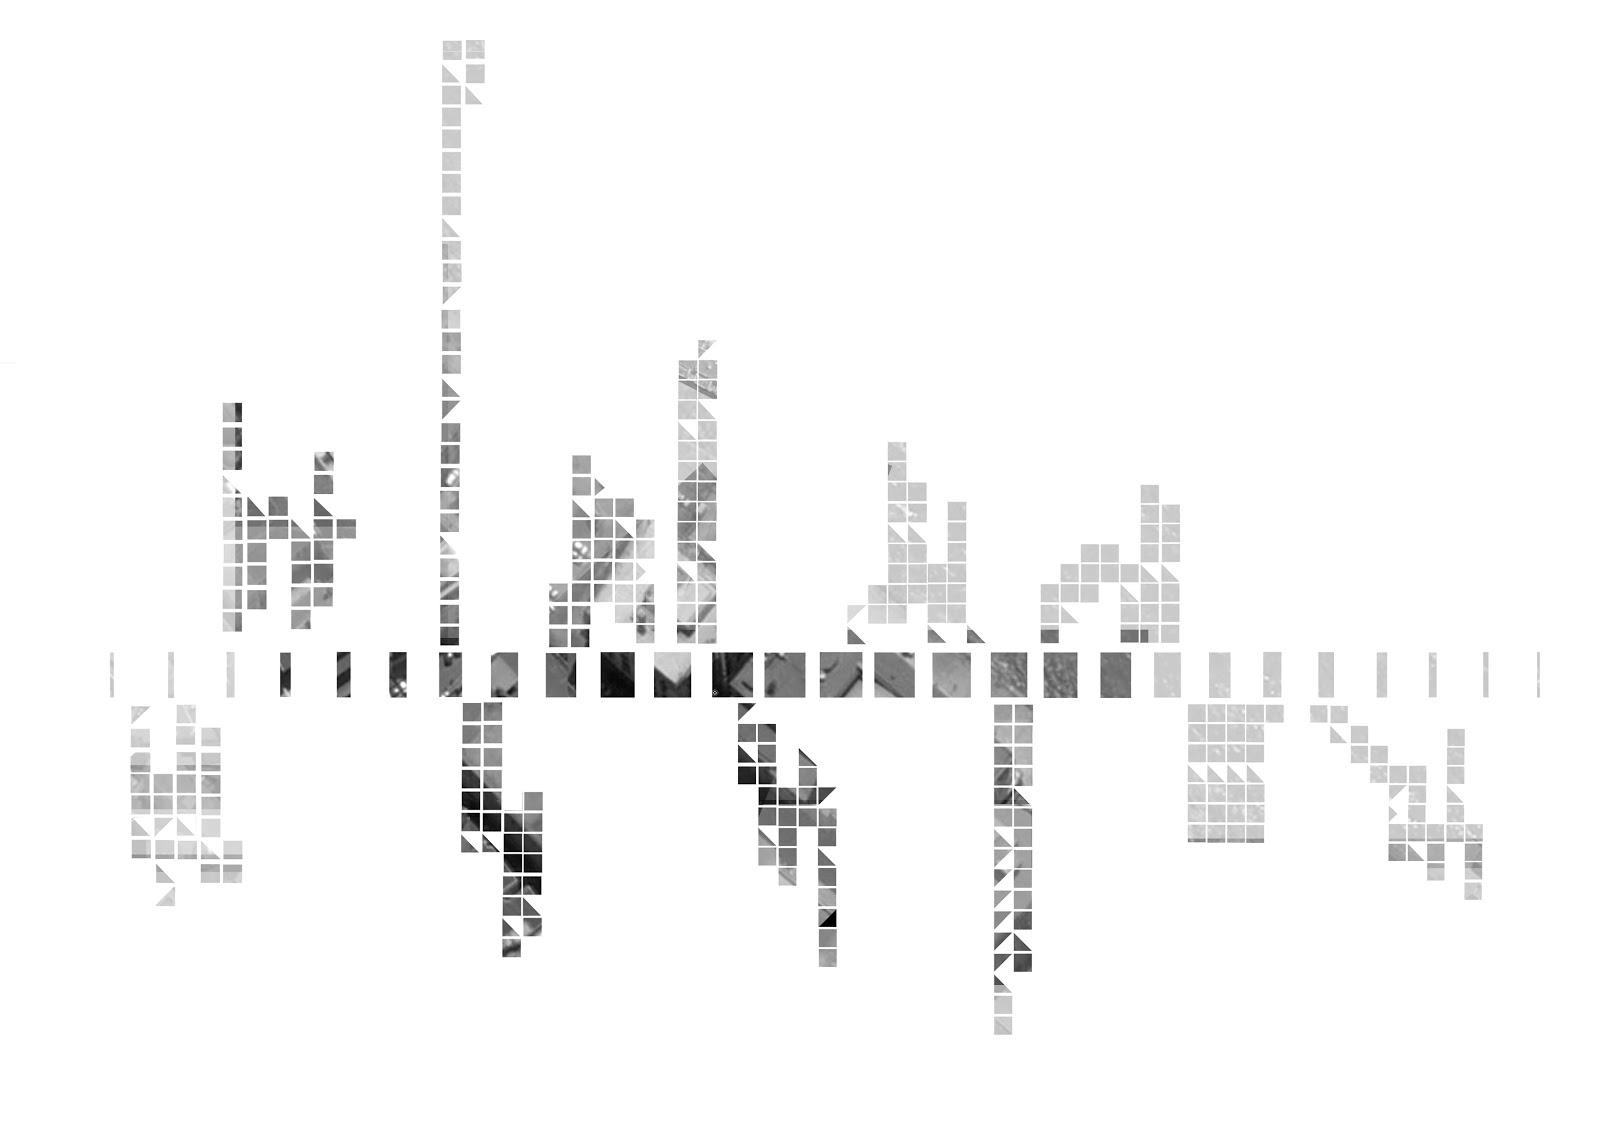 palimpsest architecture thesis